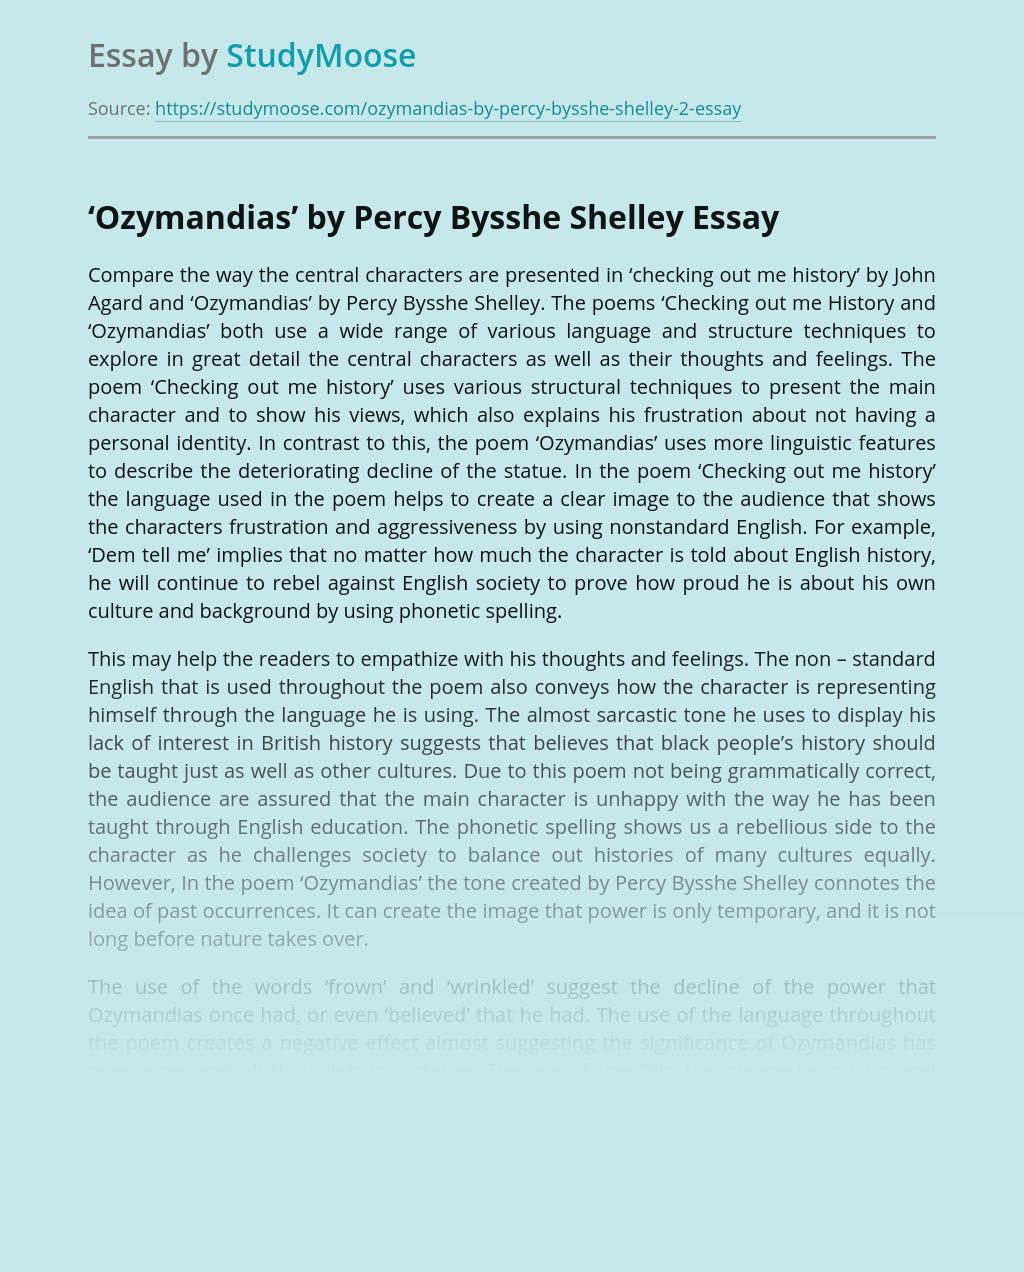 A Poem Ozymandias by Percy Bysshe Shelley